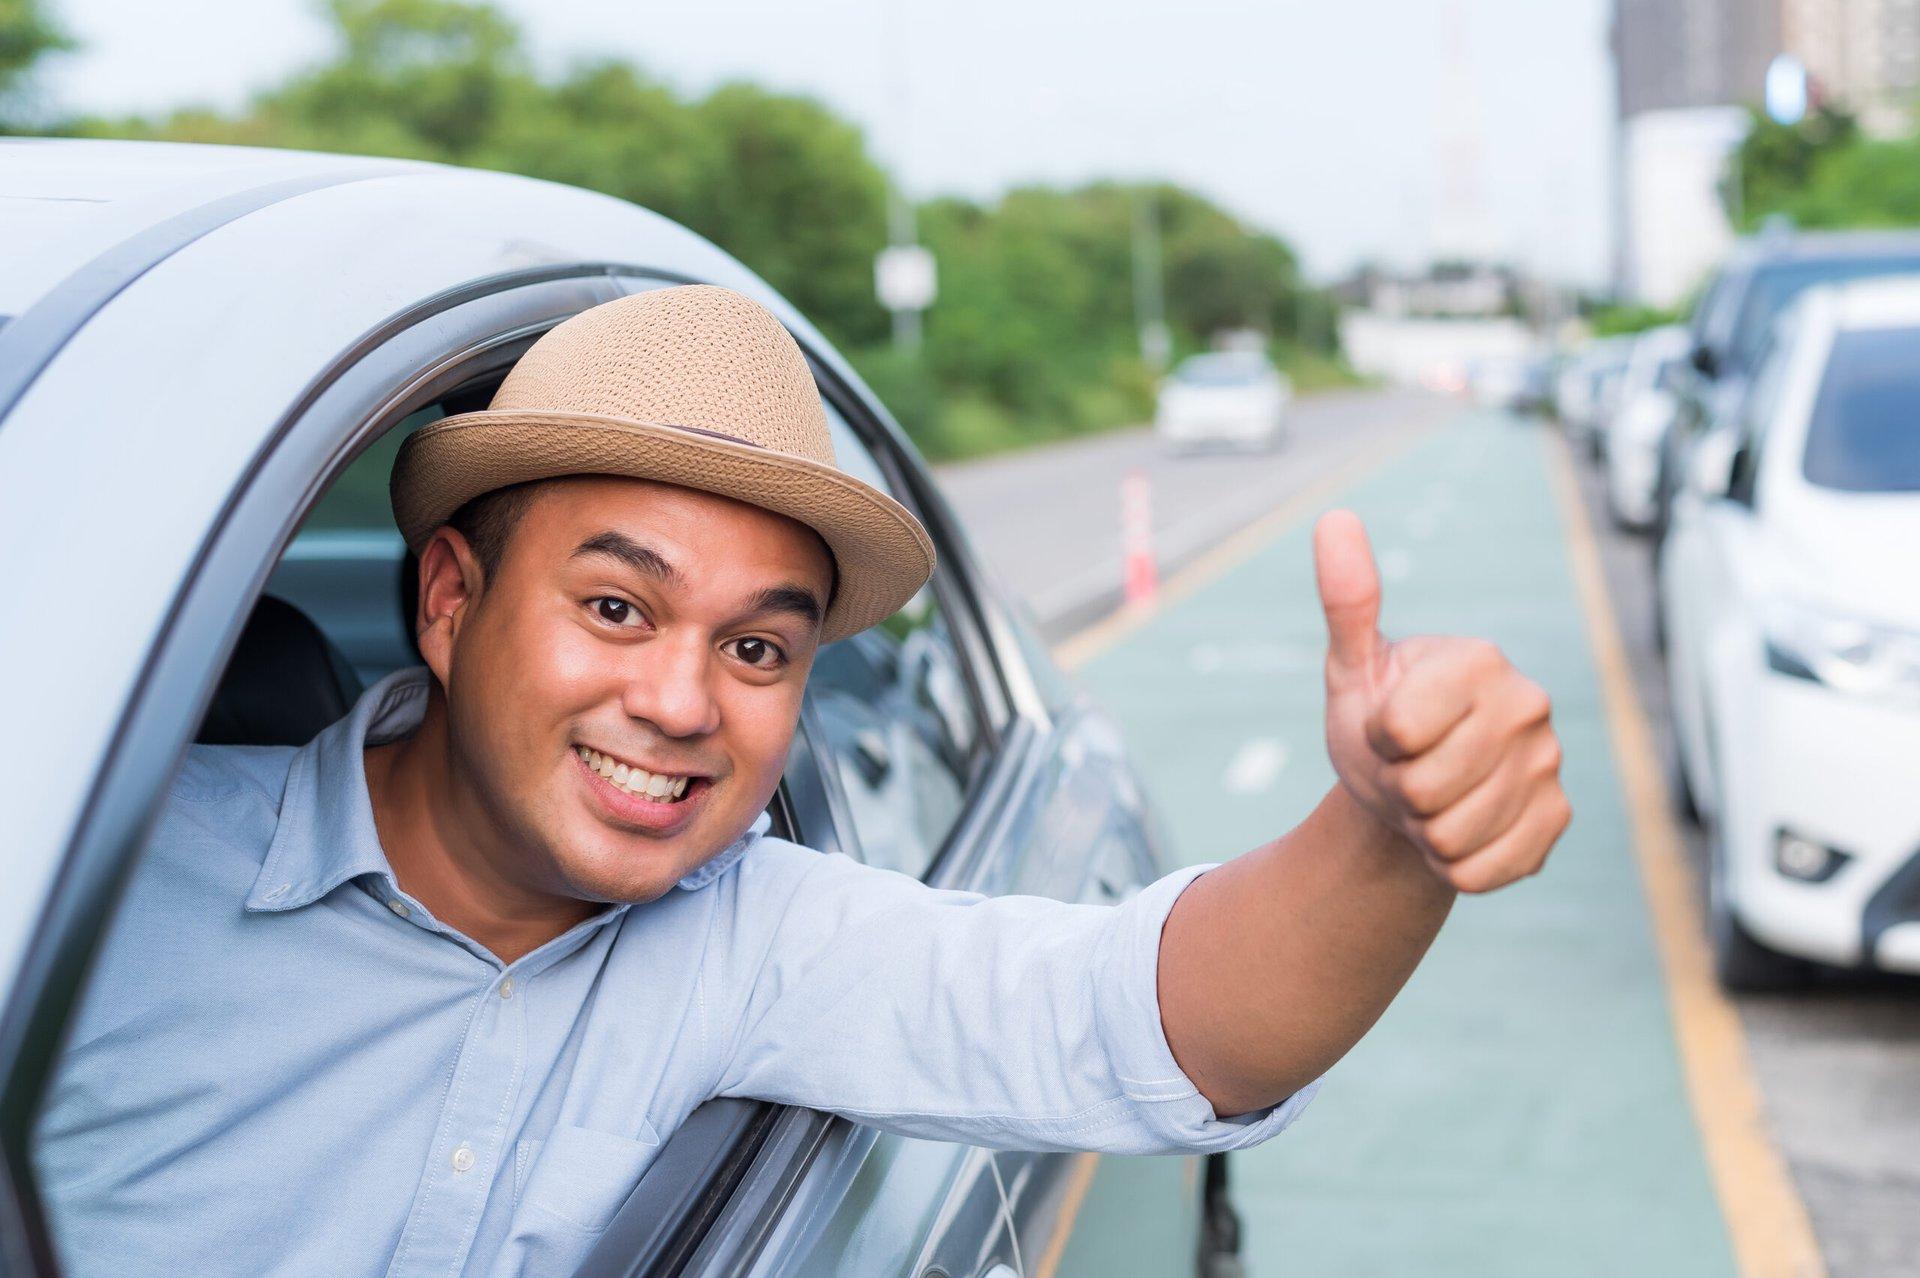 Happy driver